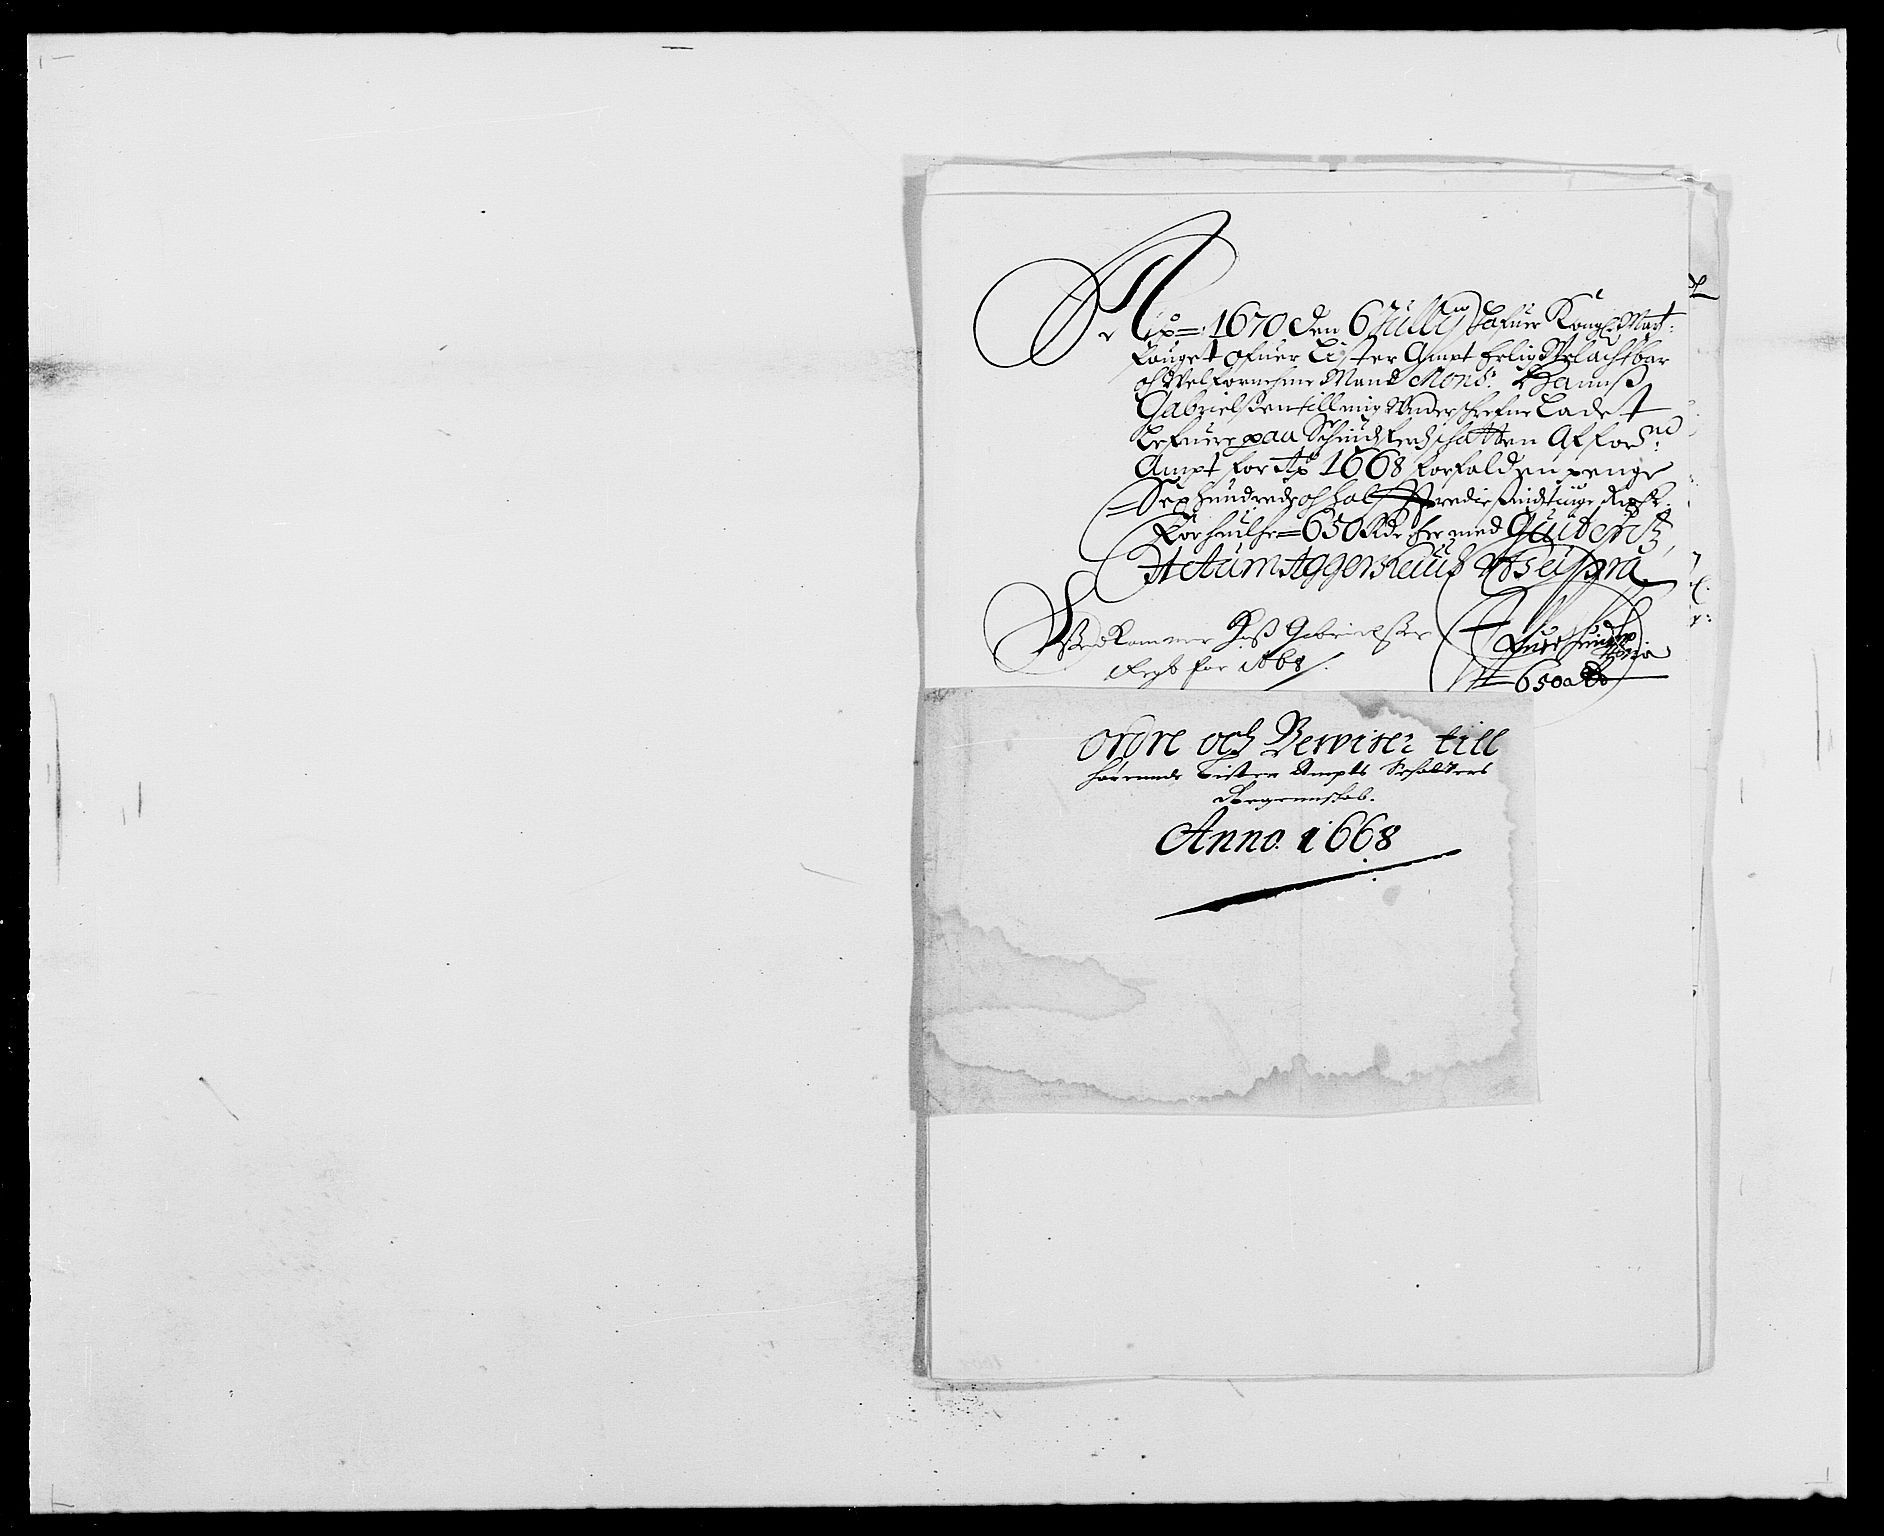 RA, Rentekammeret inntil 1814, Reviderte regnskaper, Fogderegnskap, R41/L2524: Fogderegnskap Lista, 1665-1668, s. 413